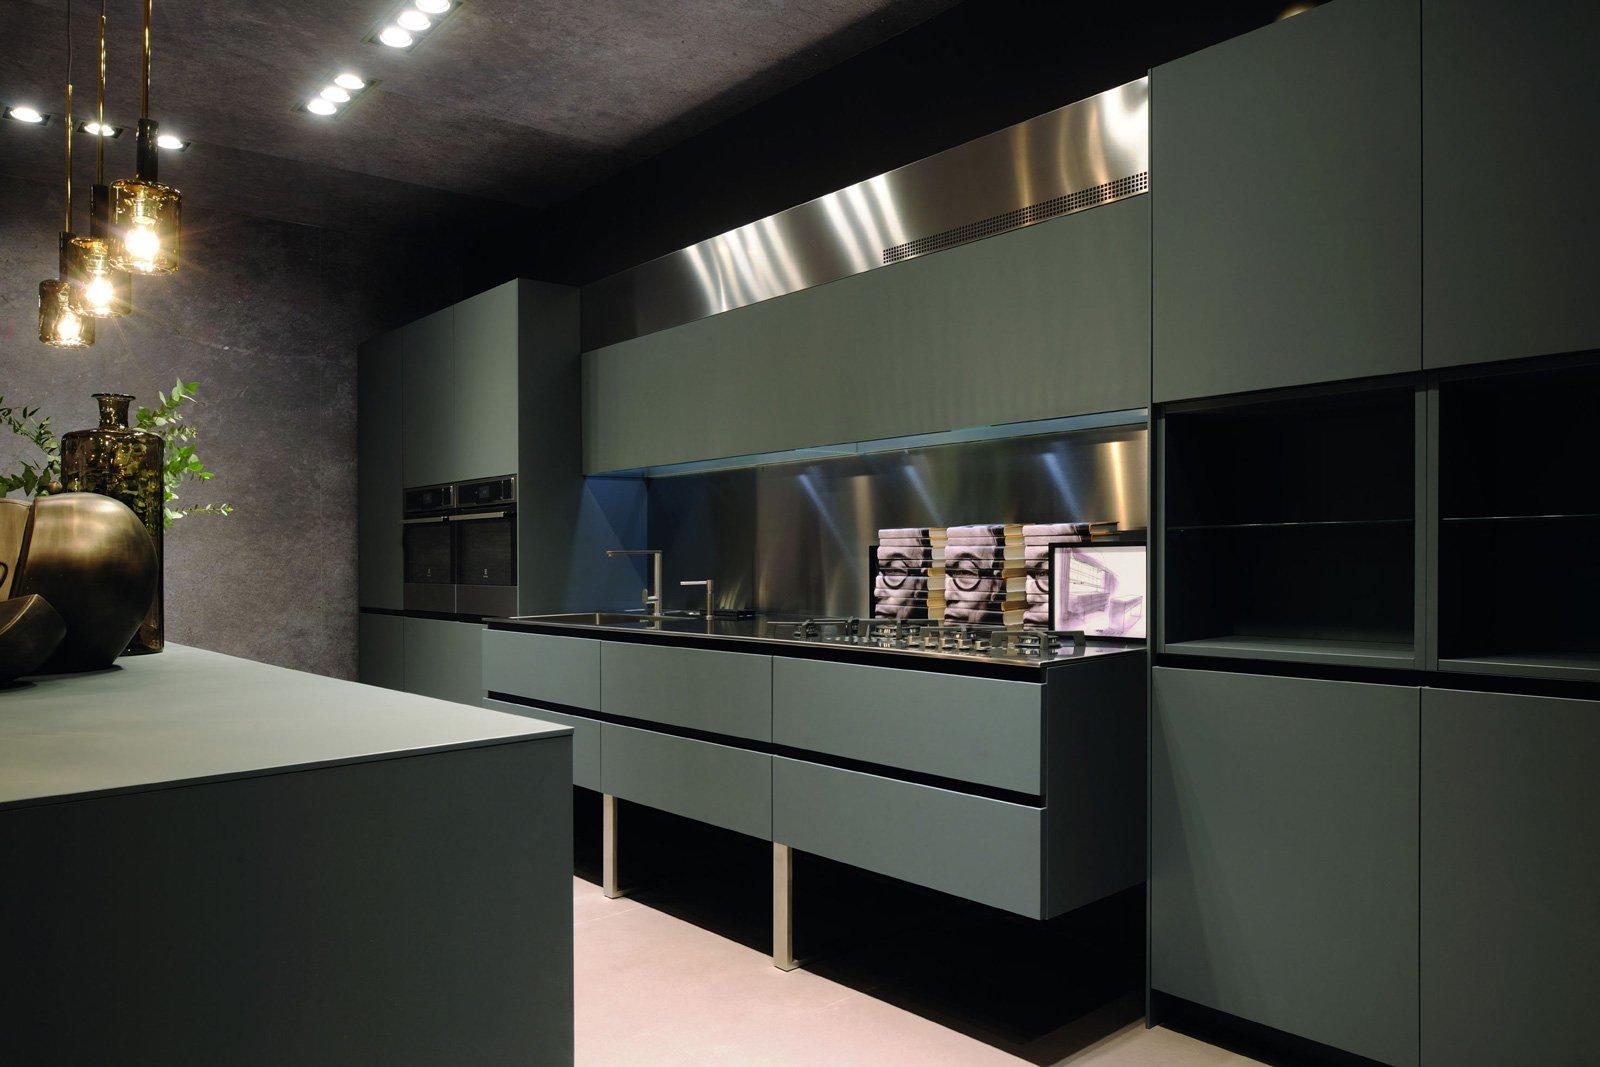 Piani Di Lavoro Innovativi Per La Cucina Cose Di Casa #875A44 1600 1067 Layout Di Cucina Design